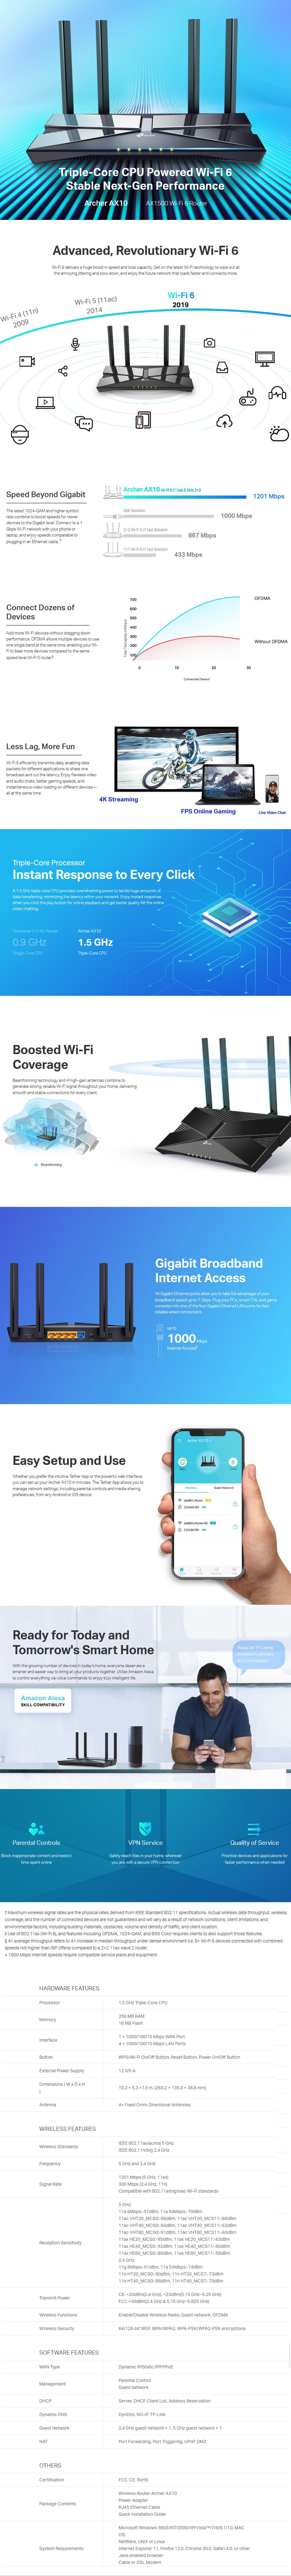 tplink-archer-ax10-ax1500-nextgen-80211ax-wifi-6-router-ac27249.jpg